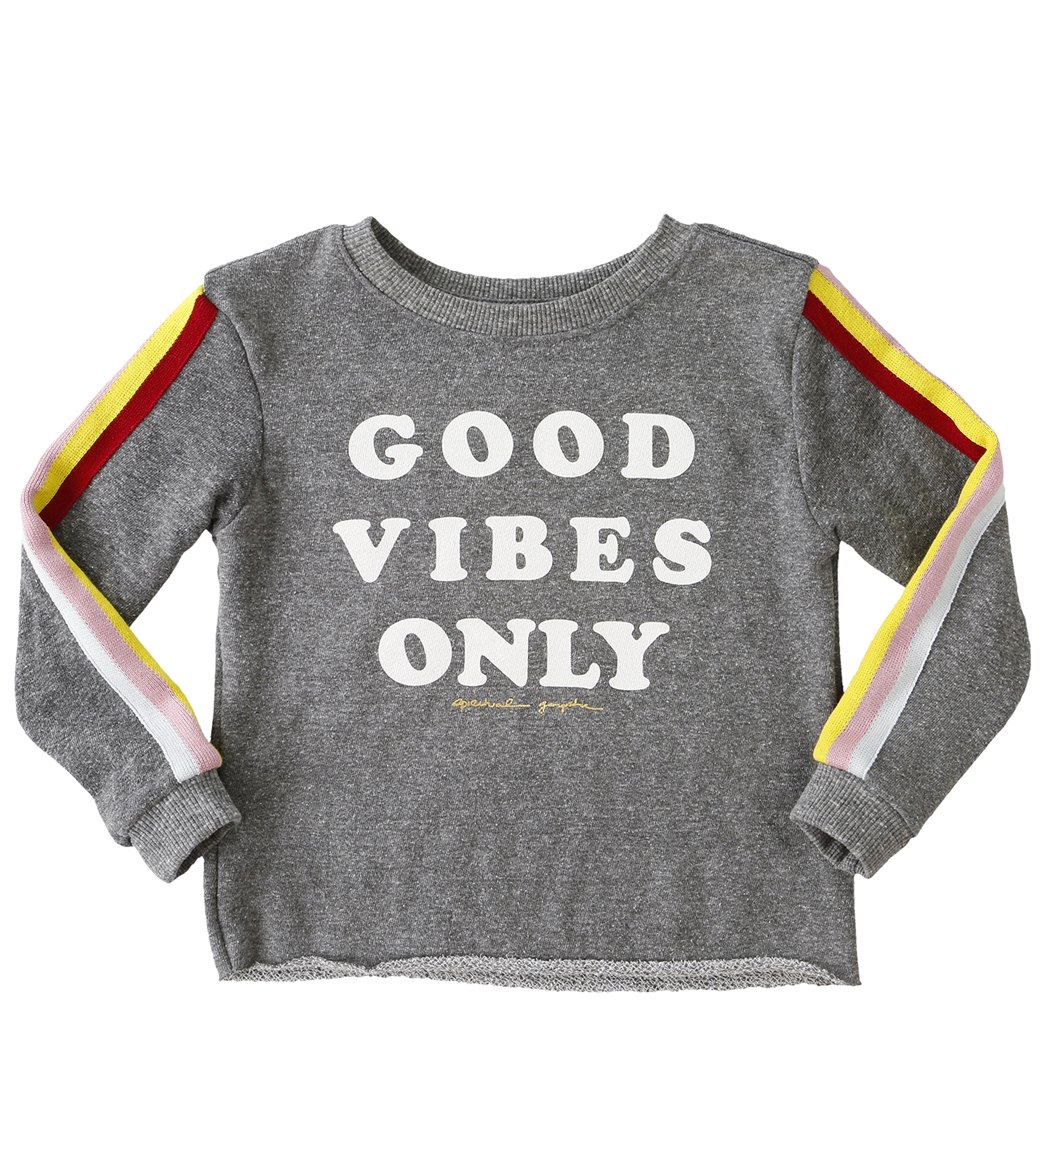 0f2d0393dac9d Spiritual Gangster Kids Good Vibes Only Yoga Crop Sweatshirt at  SwimOutlet.com - Free Shipping